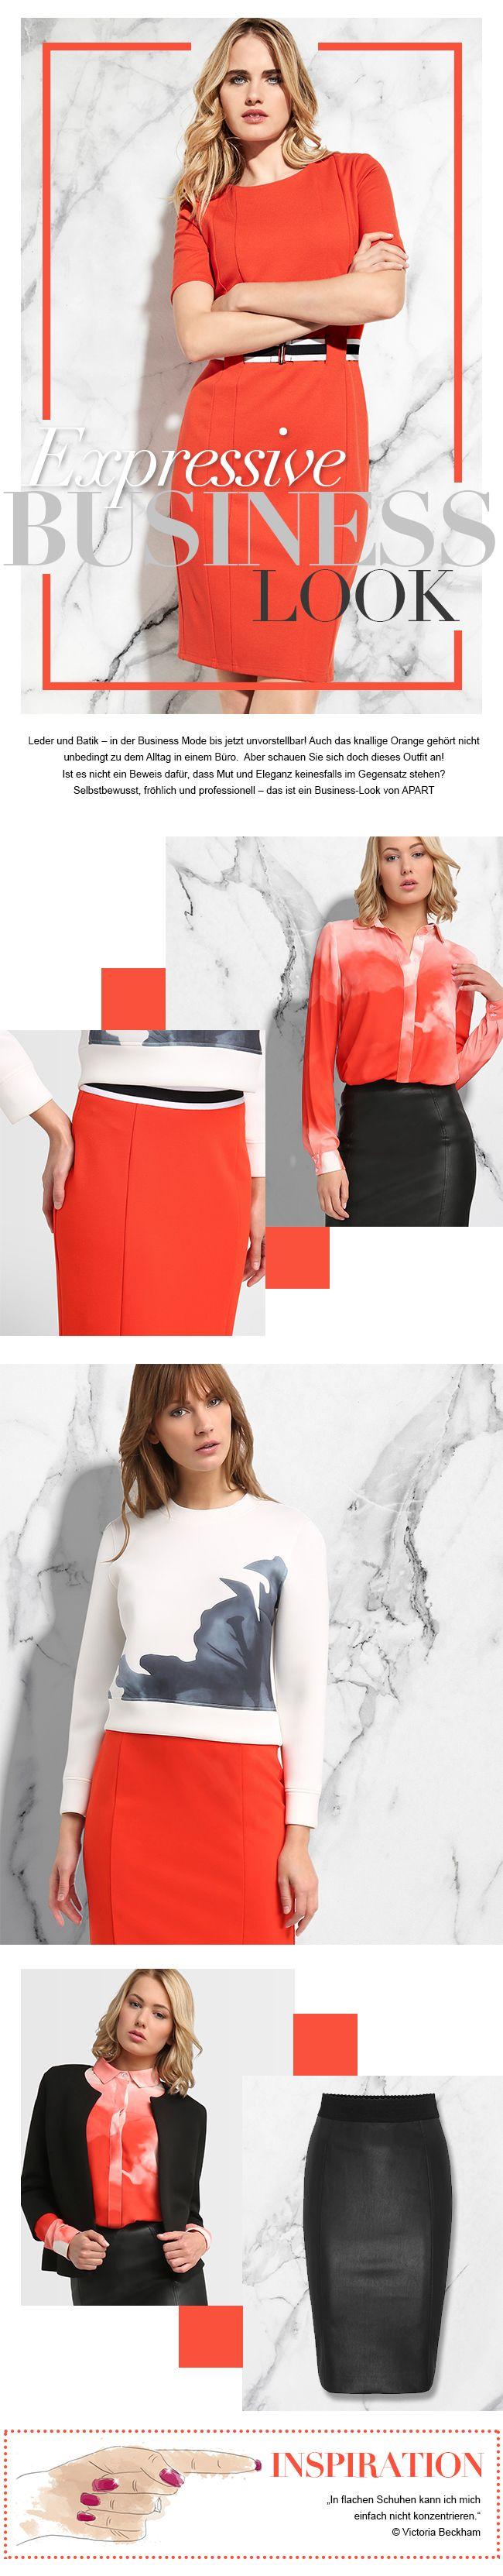 Business Look mit richtigem Pepp #abart #businessmode #businesslook #büromode #orange #ixpressive #mode #fashiontrends  #styling #stylingtipps #stylingtippsbuero